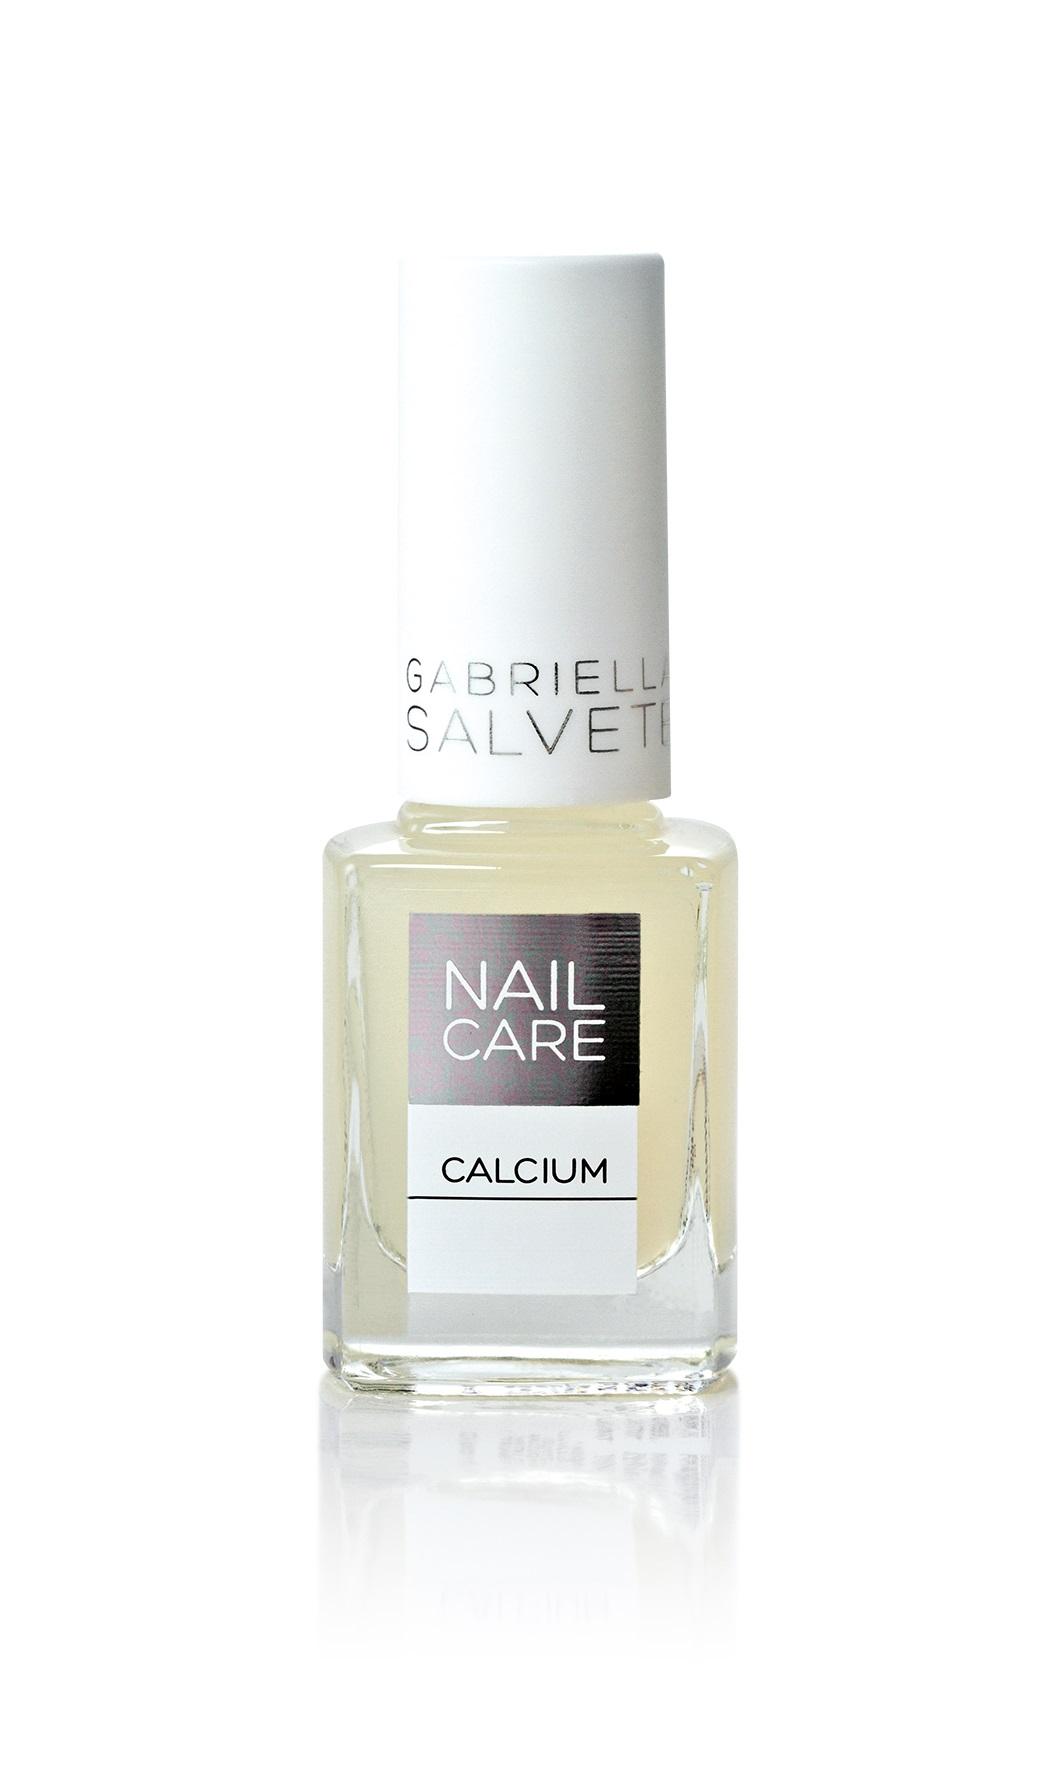 Gabriella Salvete Nail Care Calcium Kalciovy Regeneracni Lak Na Nehty 11 Ml Odstin 04 Levne Blesk Zbozi